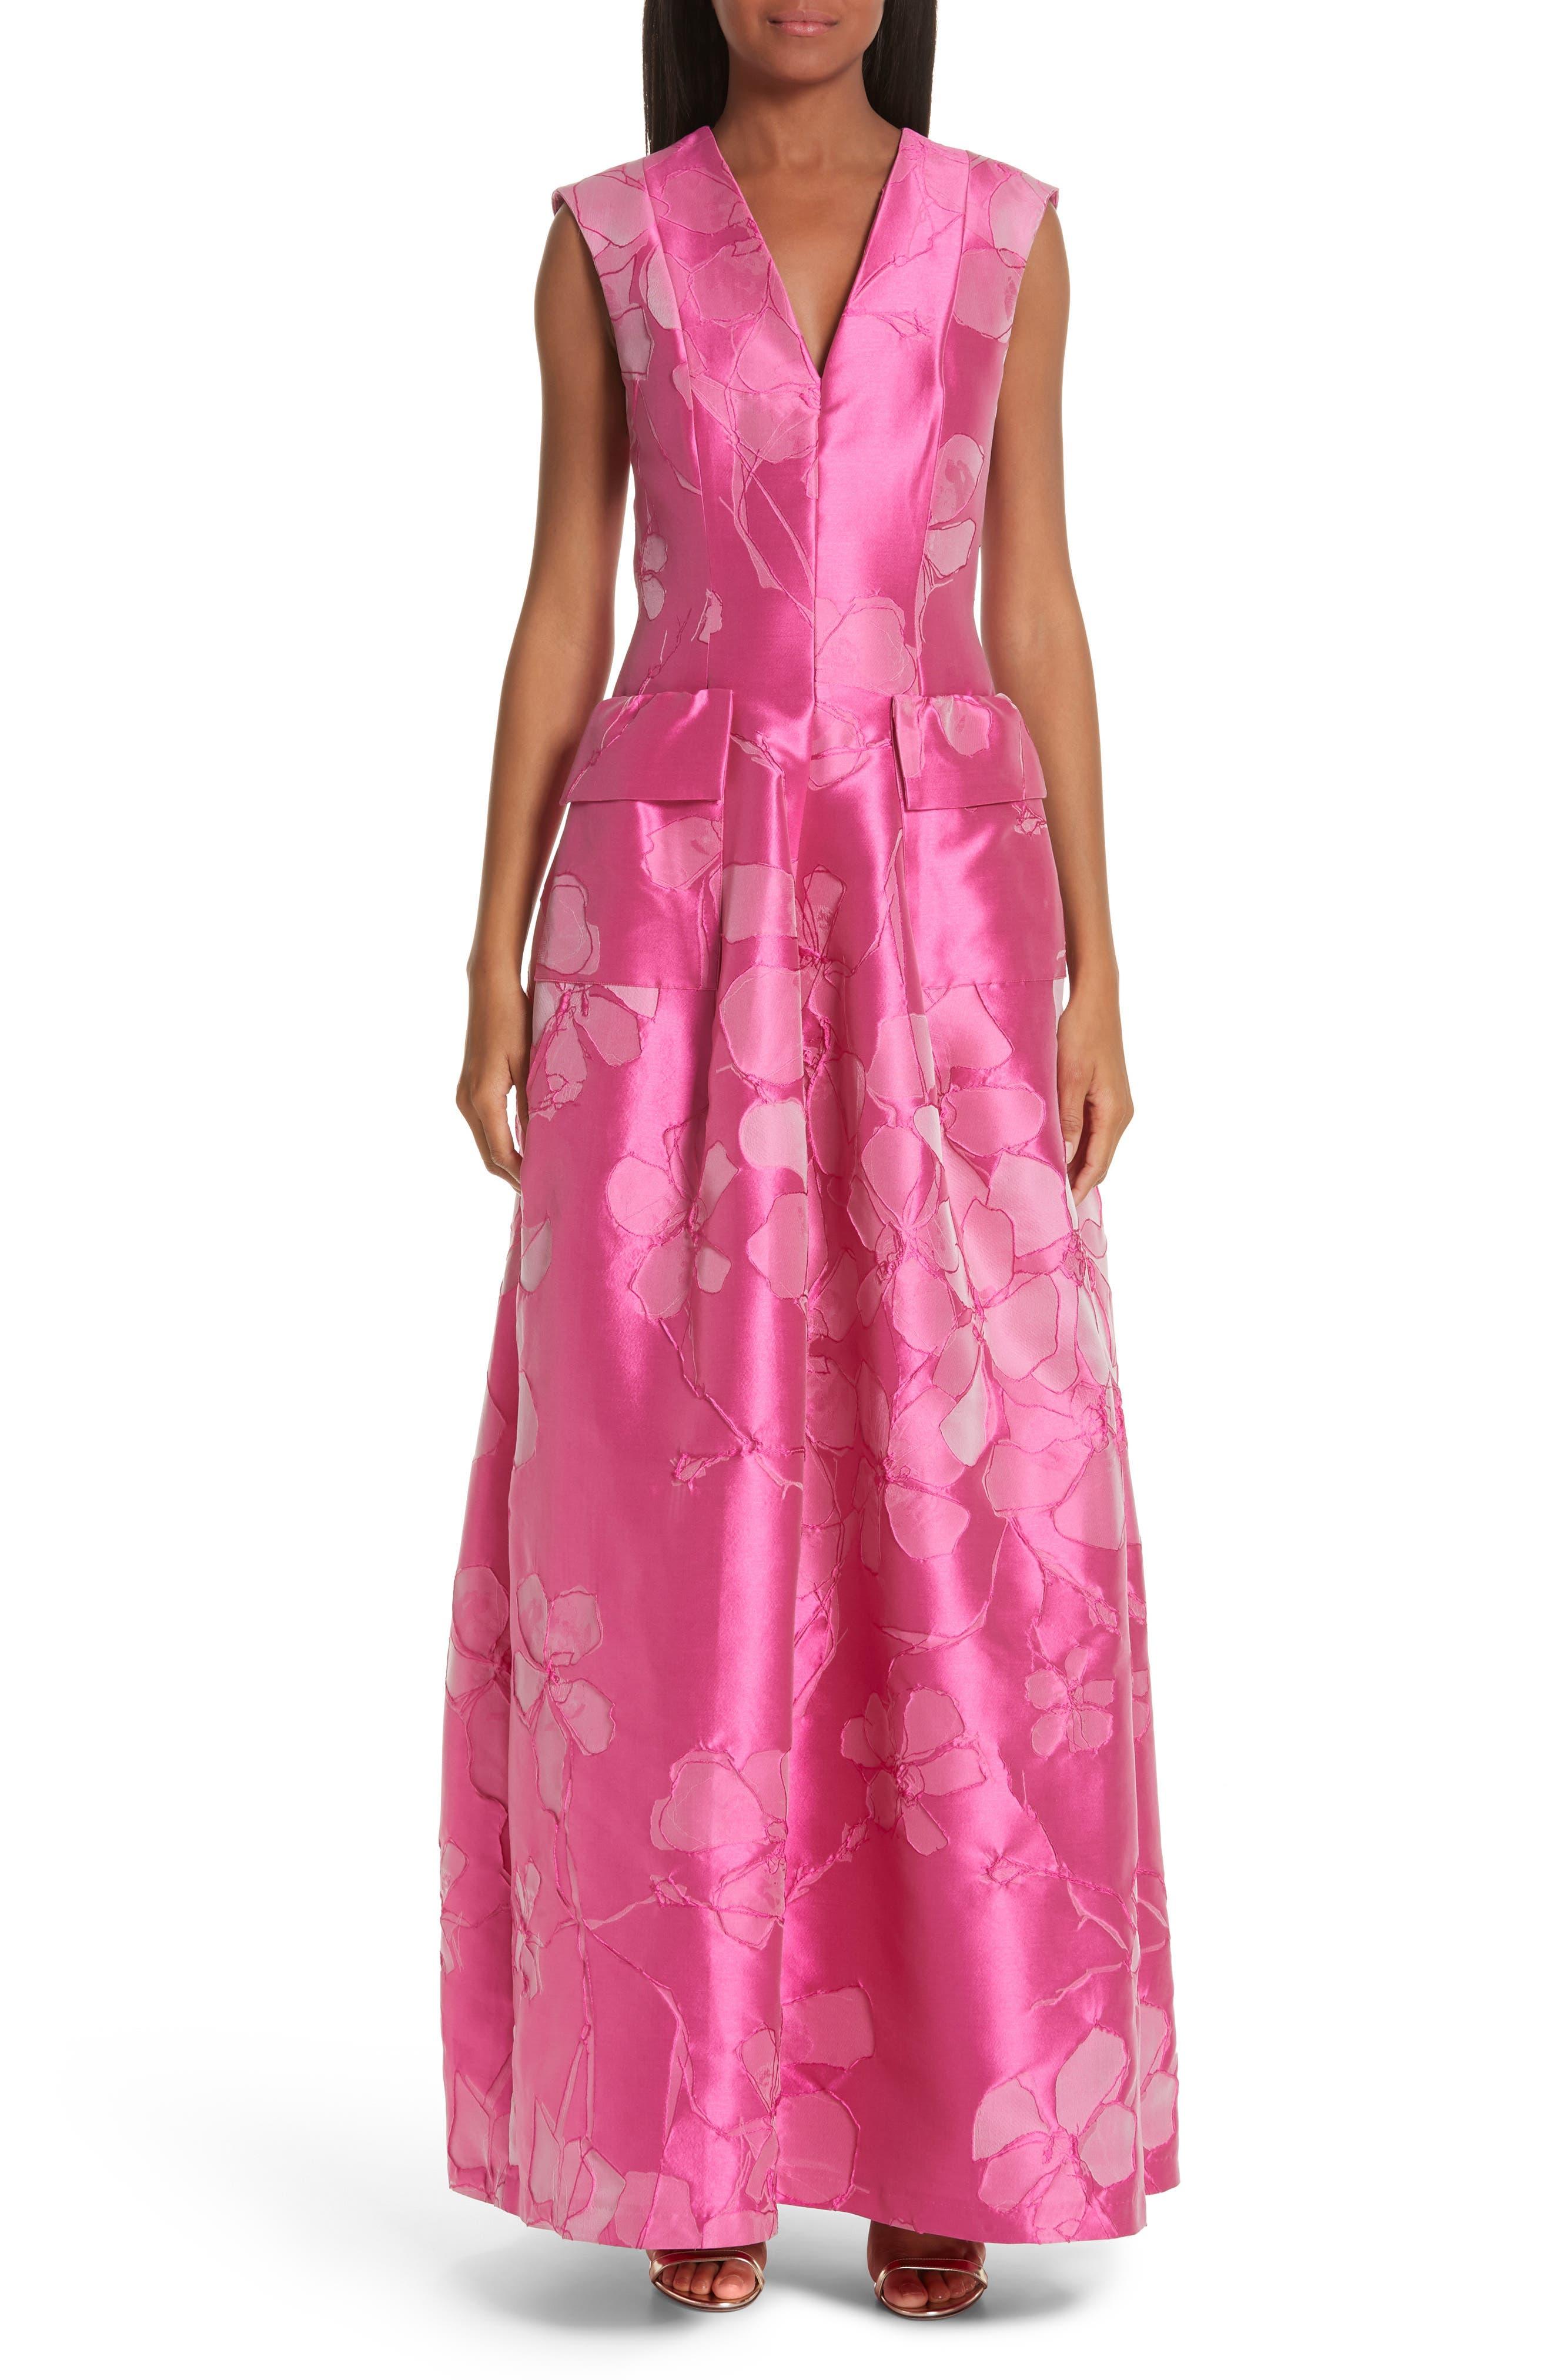 TALBOT RUNHOF Floral V-Neck Evening Dress, Main, color, FUCHSIA PINK